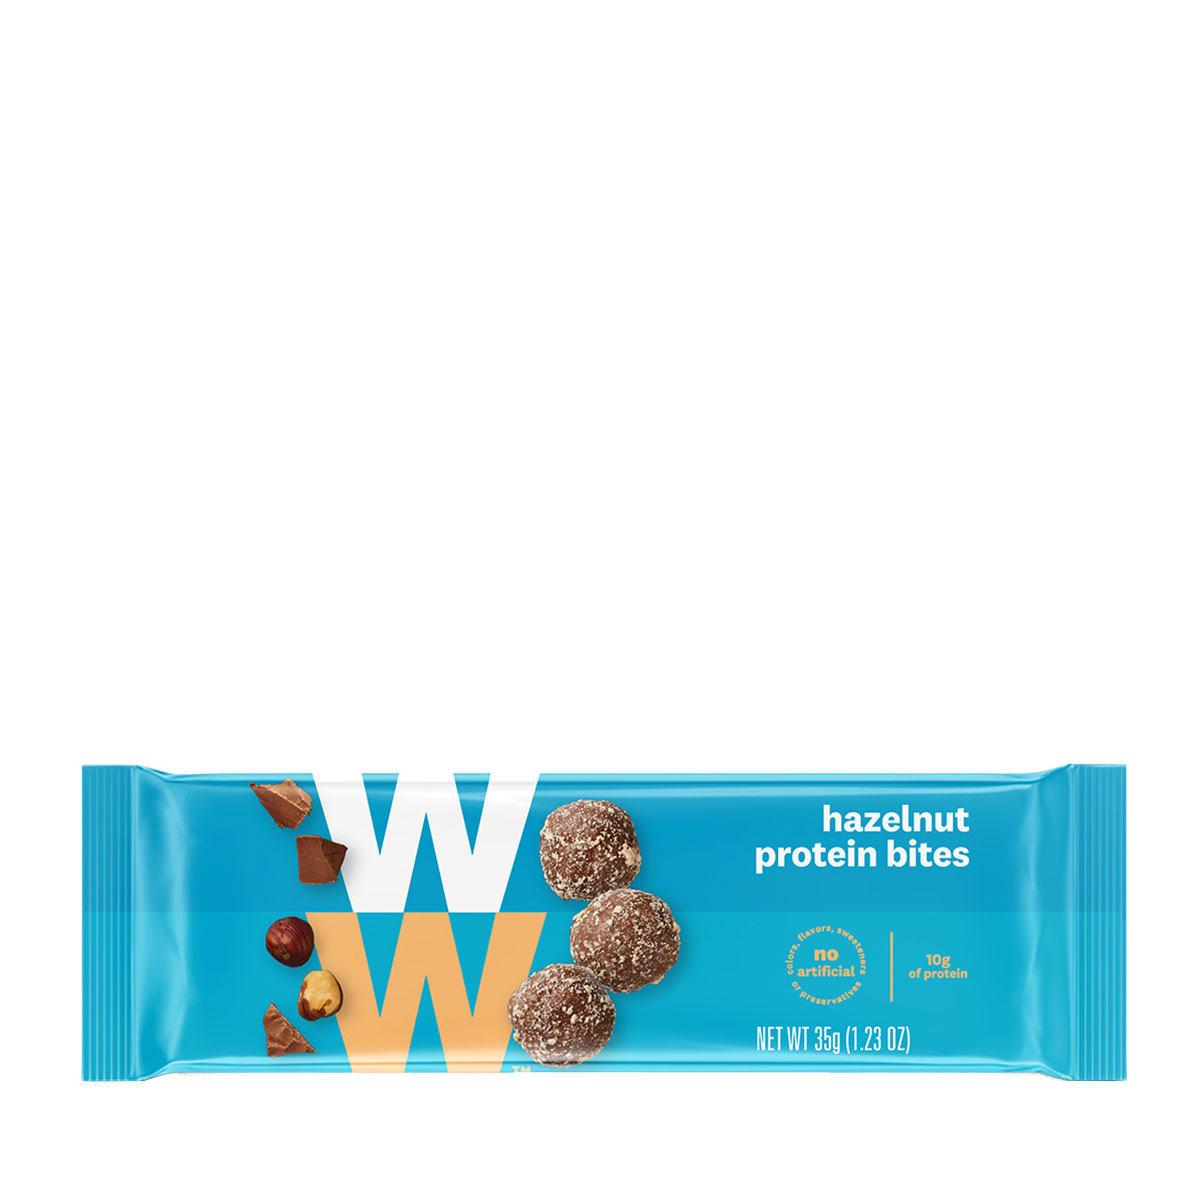 Hazelnut Protein Bites - front of pack, 3 bites per pack